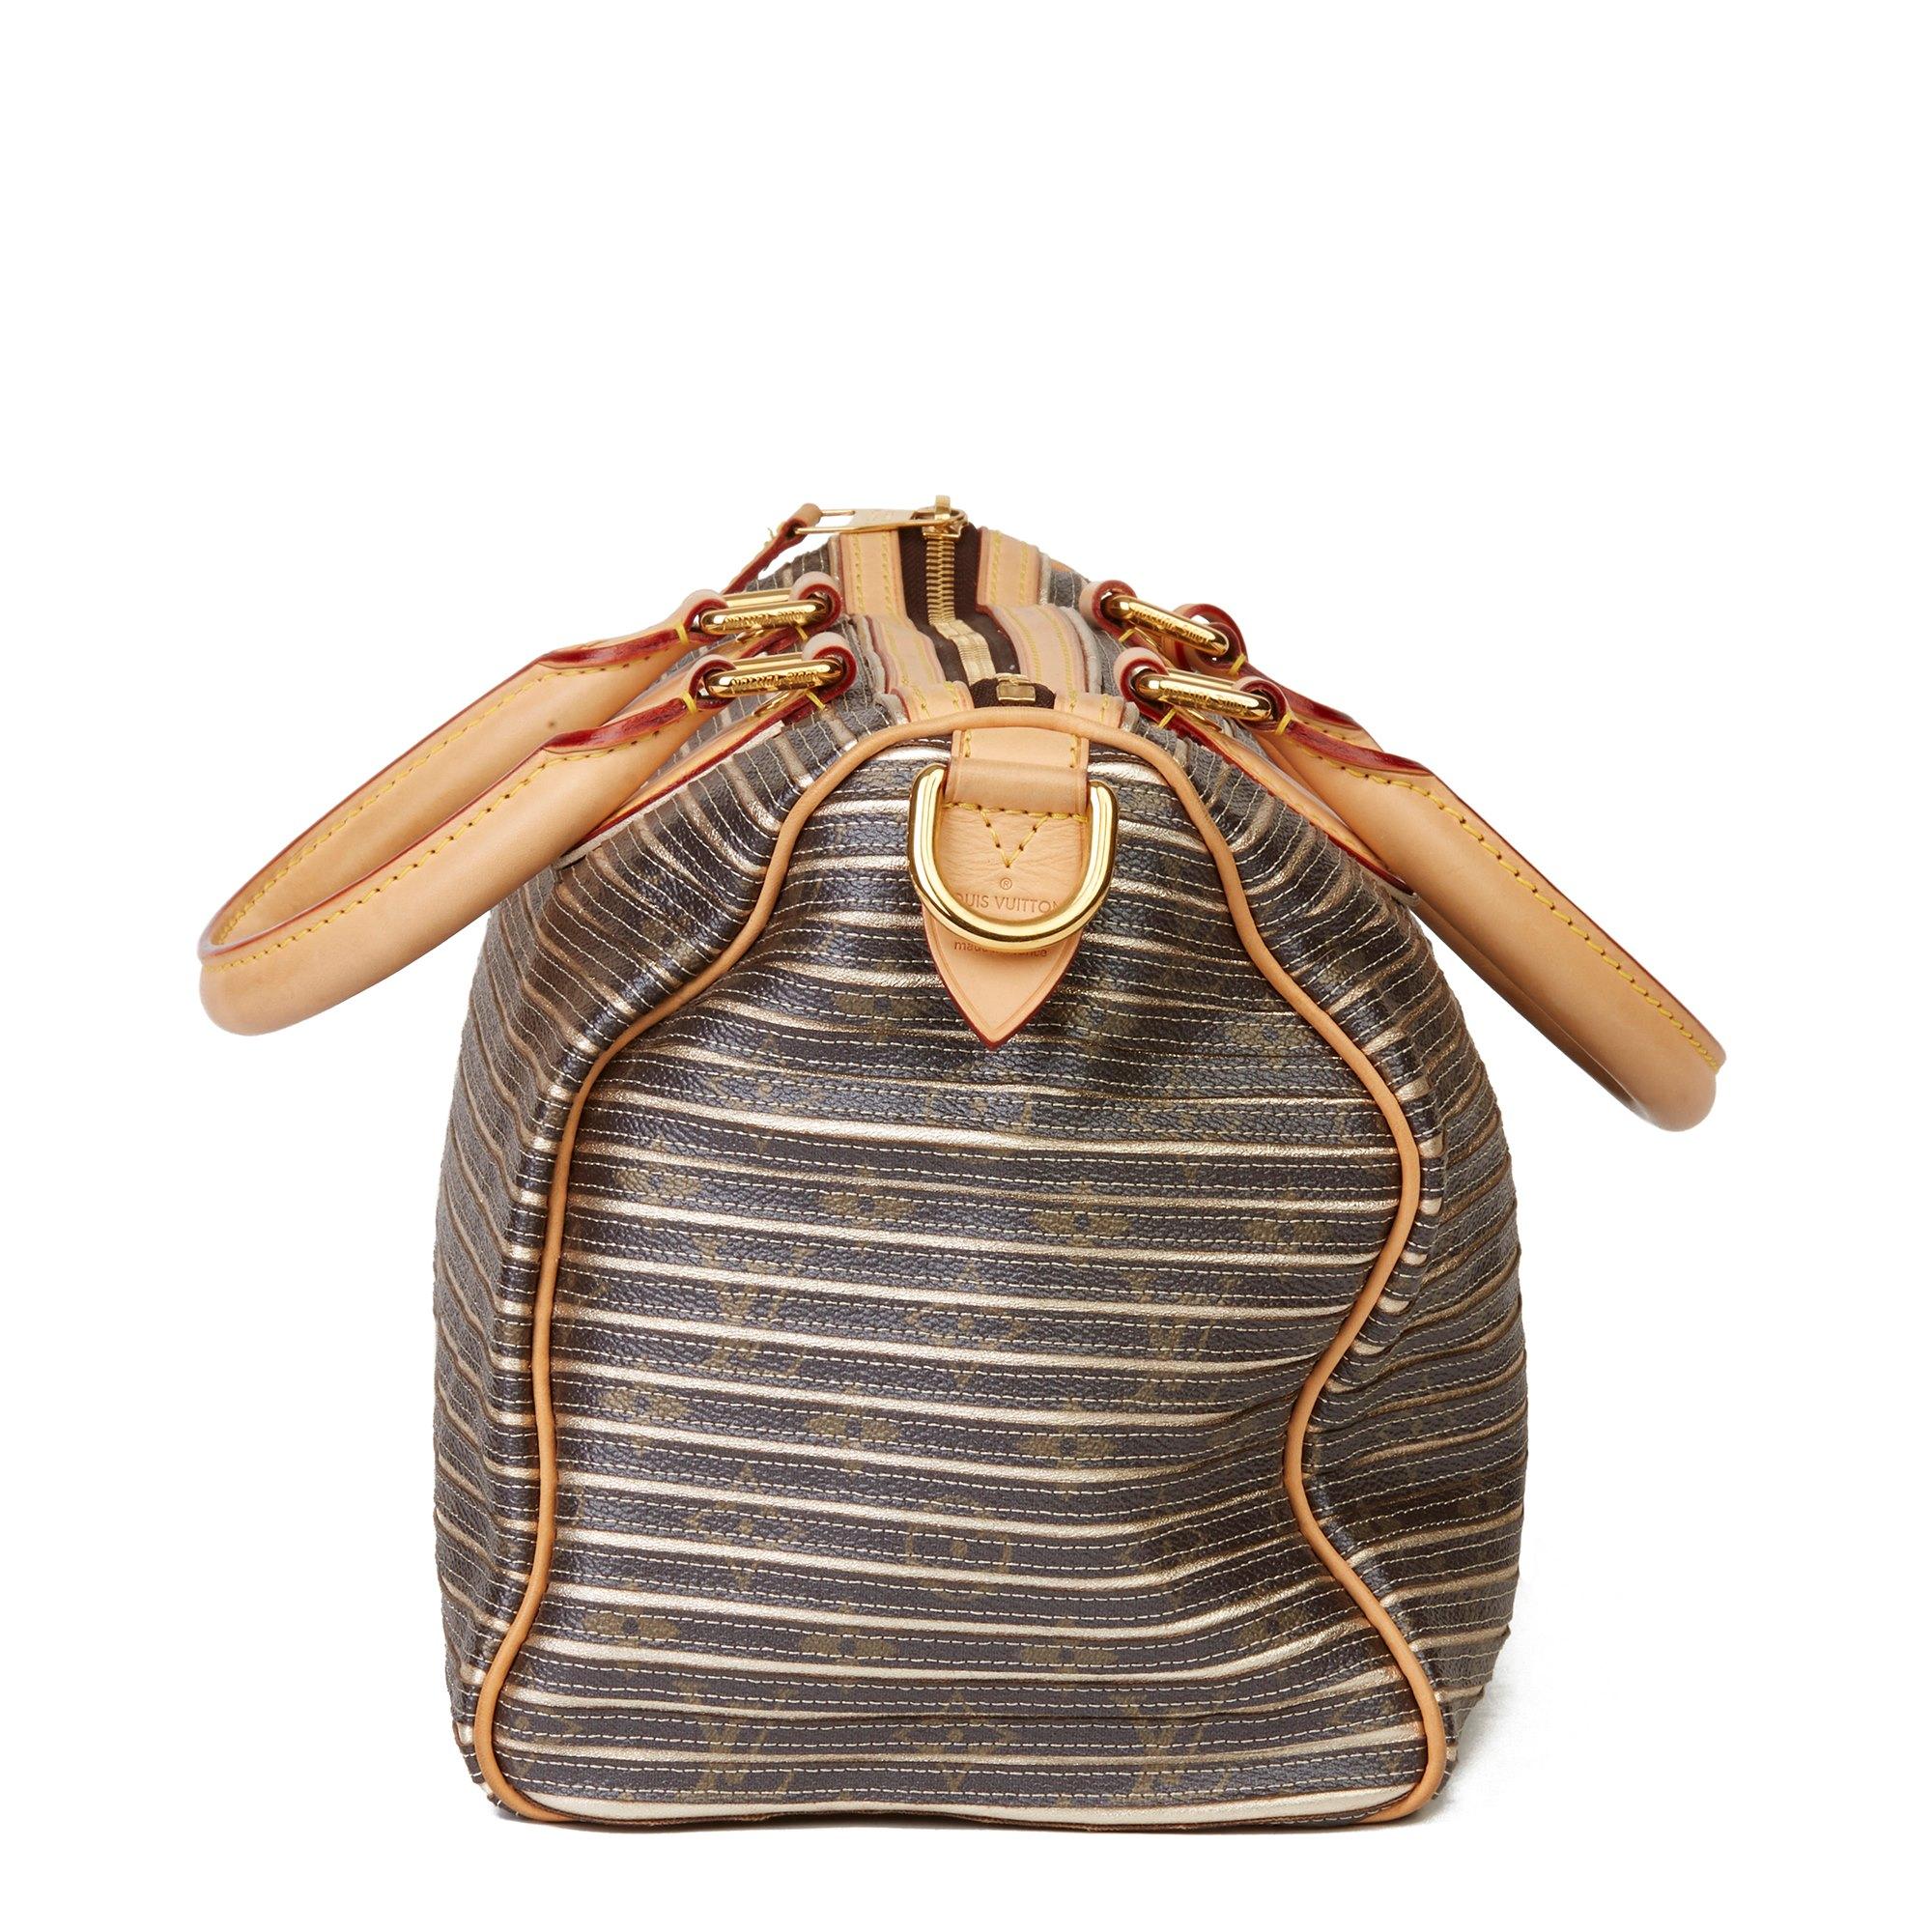 Louis Vuitton Brown Monogram Coated Canvas & Gold Metallic Lambskin Leather Argent Eden Speedy 30